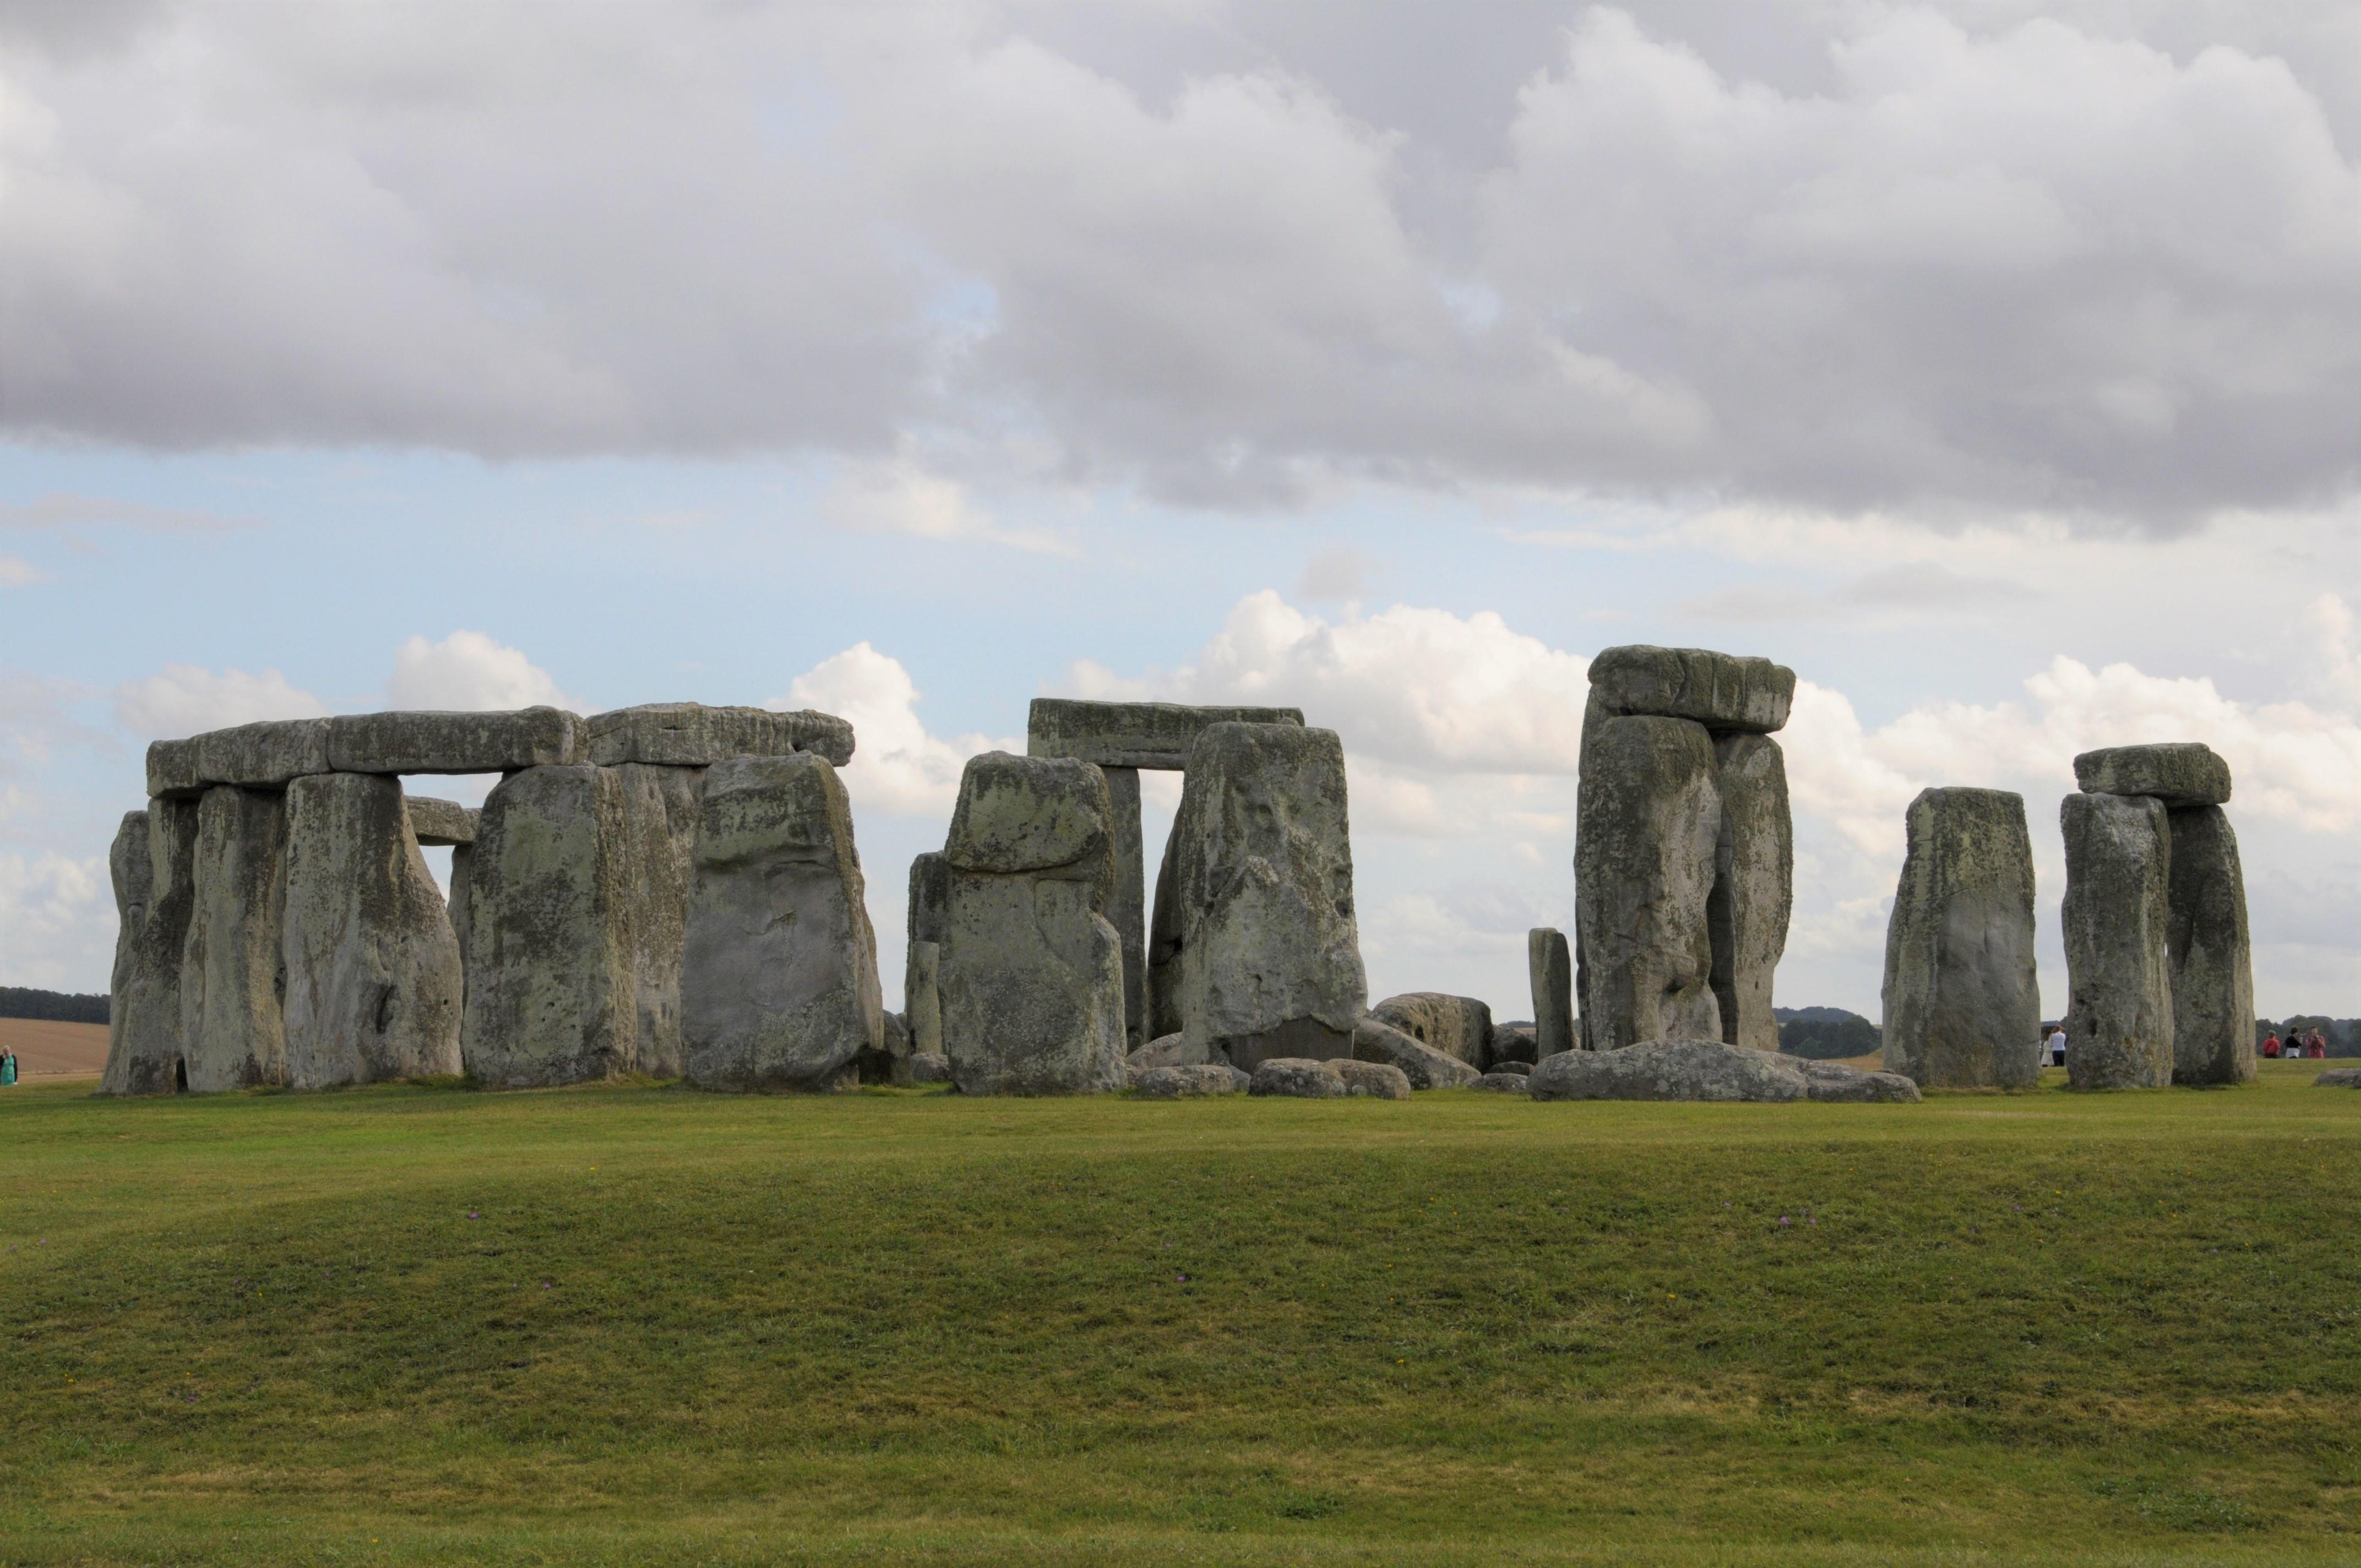 imagen de Monumento megalítico de Stonehenge, en Reino Unido. / Incipit